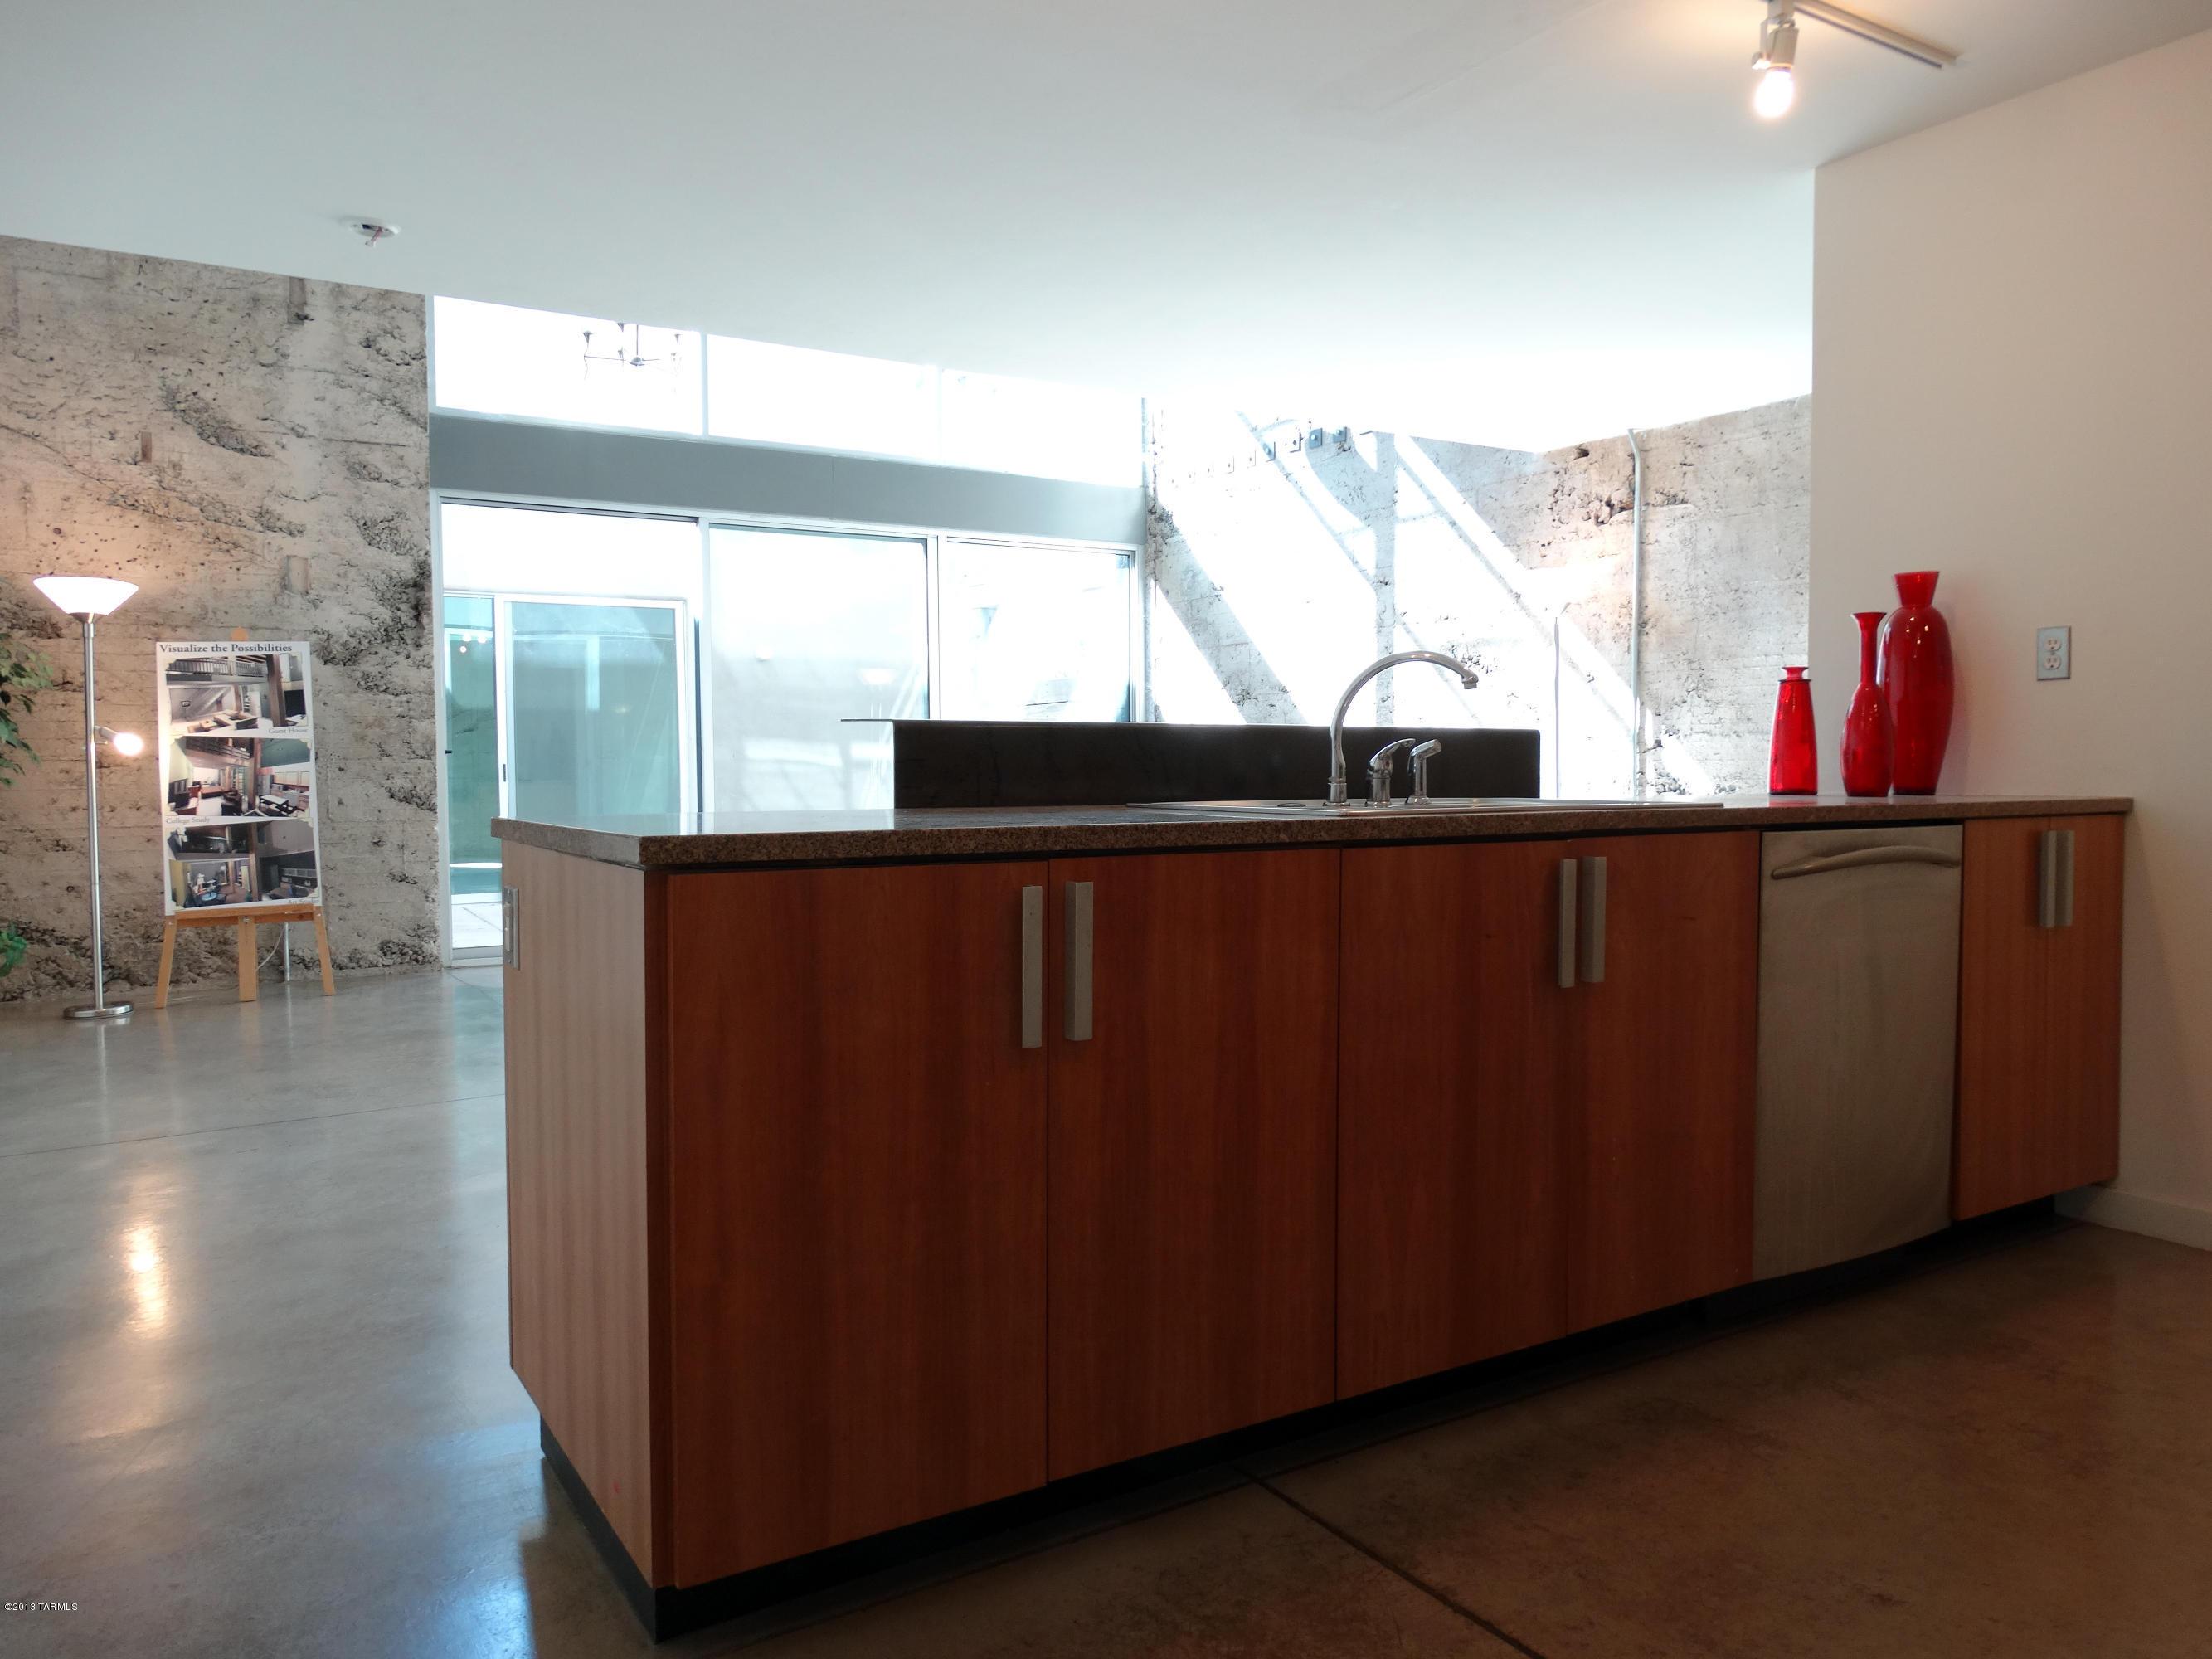 Fantastic Ice House Loft 111 Near Downtown Tucson Az Is For Sale Download Free Architecture Designs Fluibritishbridgeorg